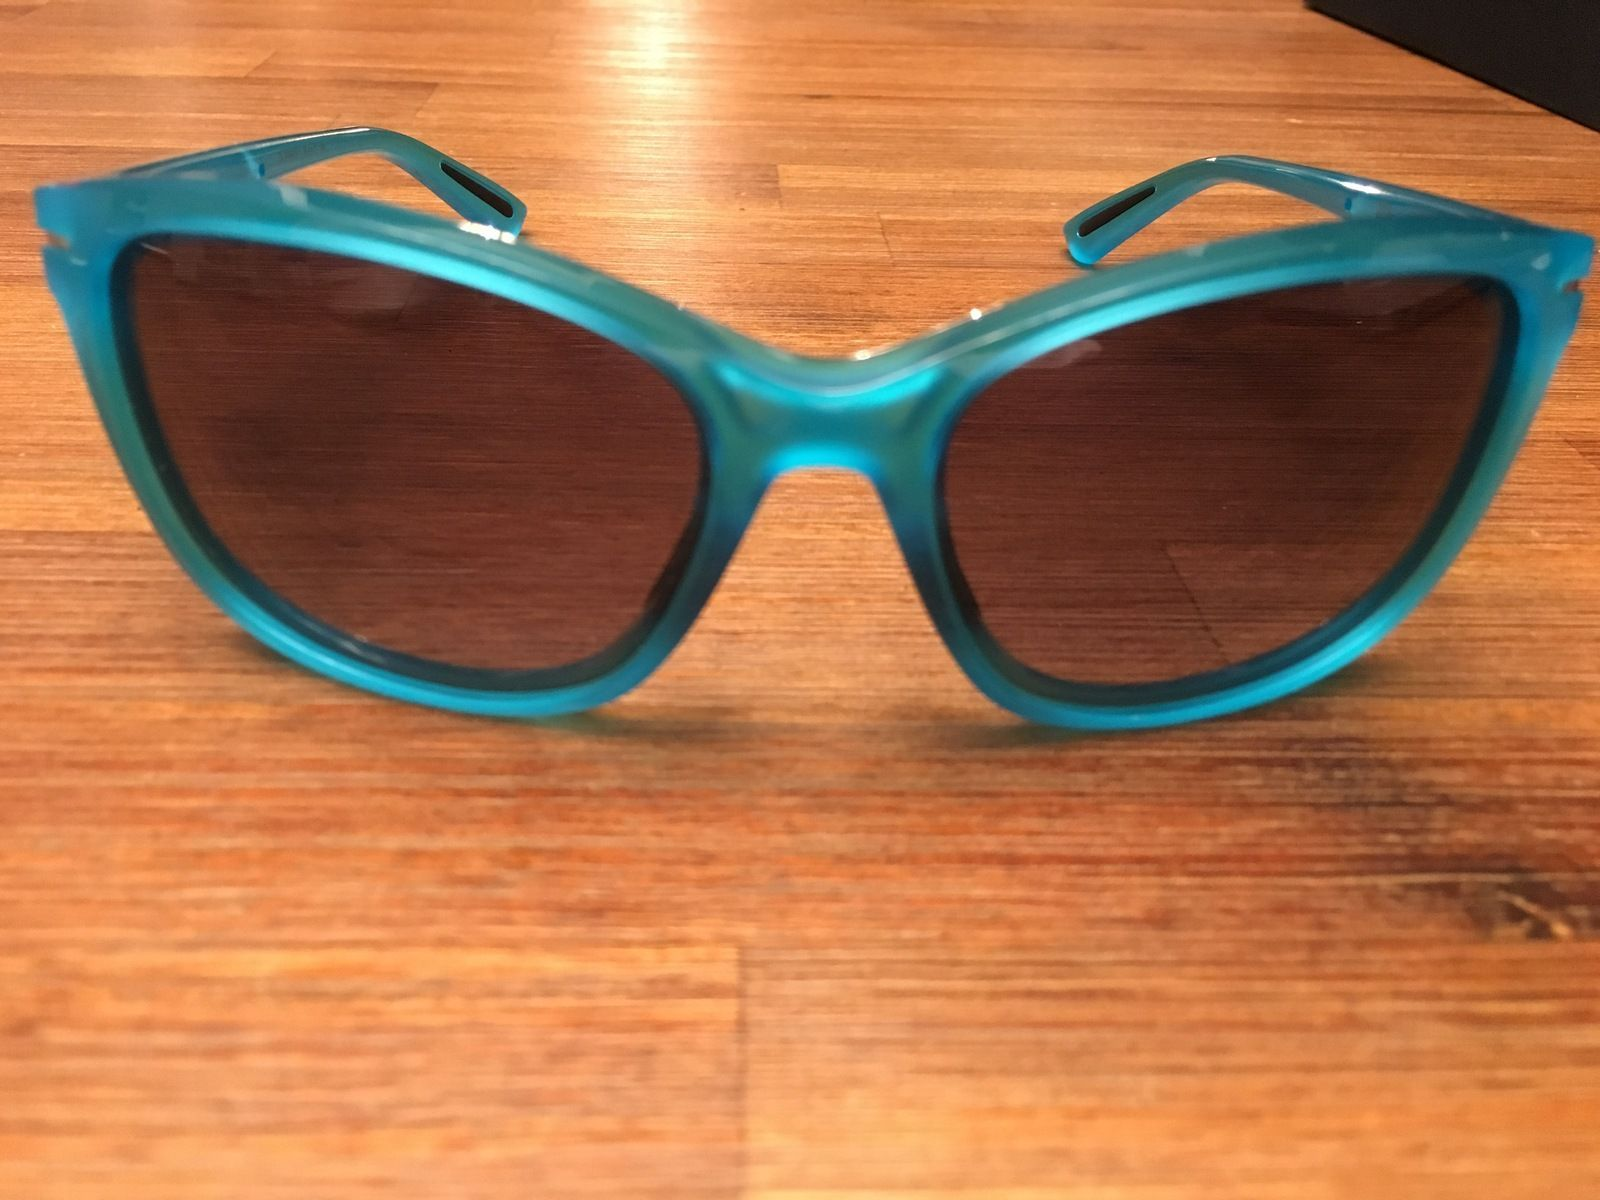 Picked up some new glasses today! - 8b1uT6.jpg